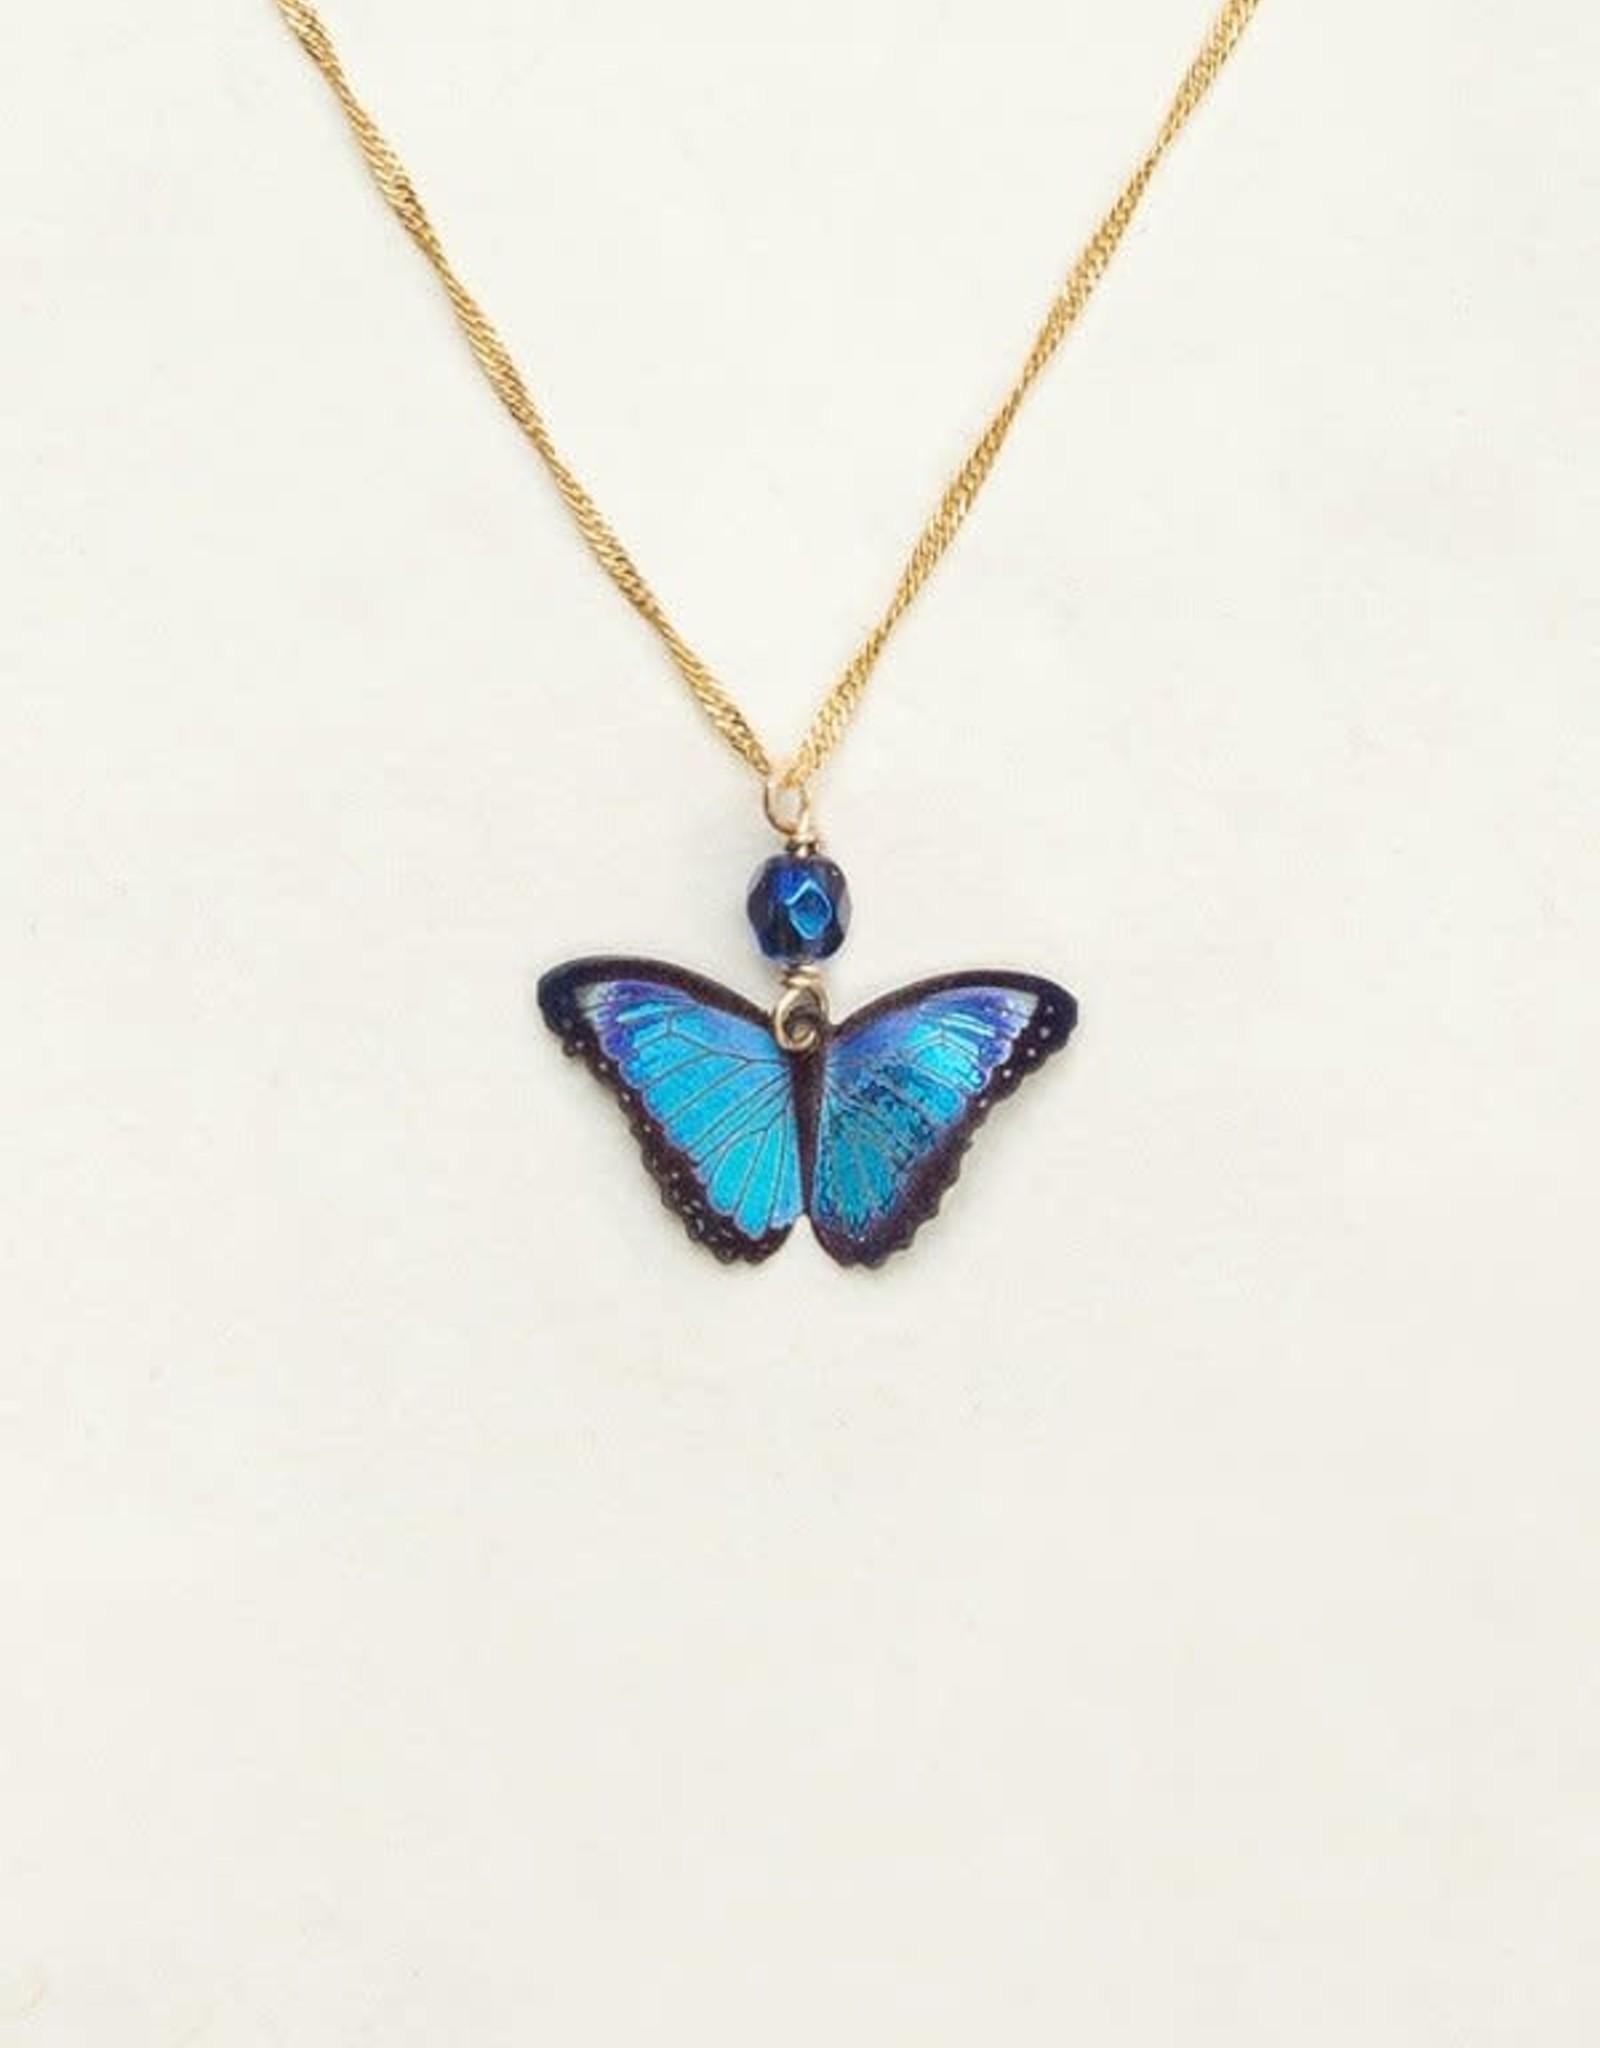 Holly Yashi Blue Radiance Bella Butterfly Pendant Necklace